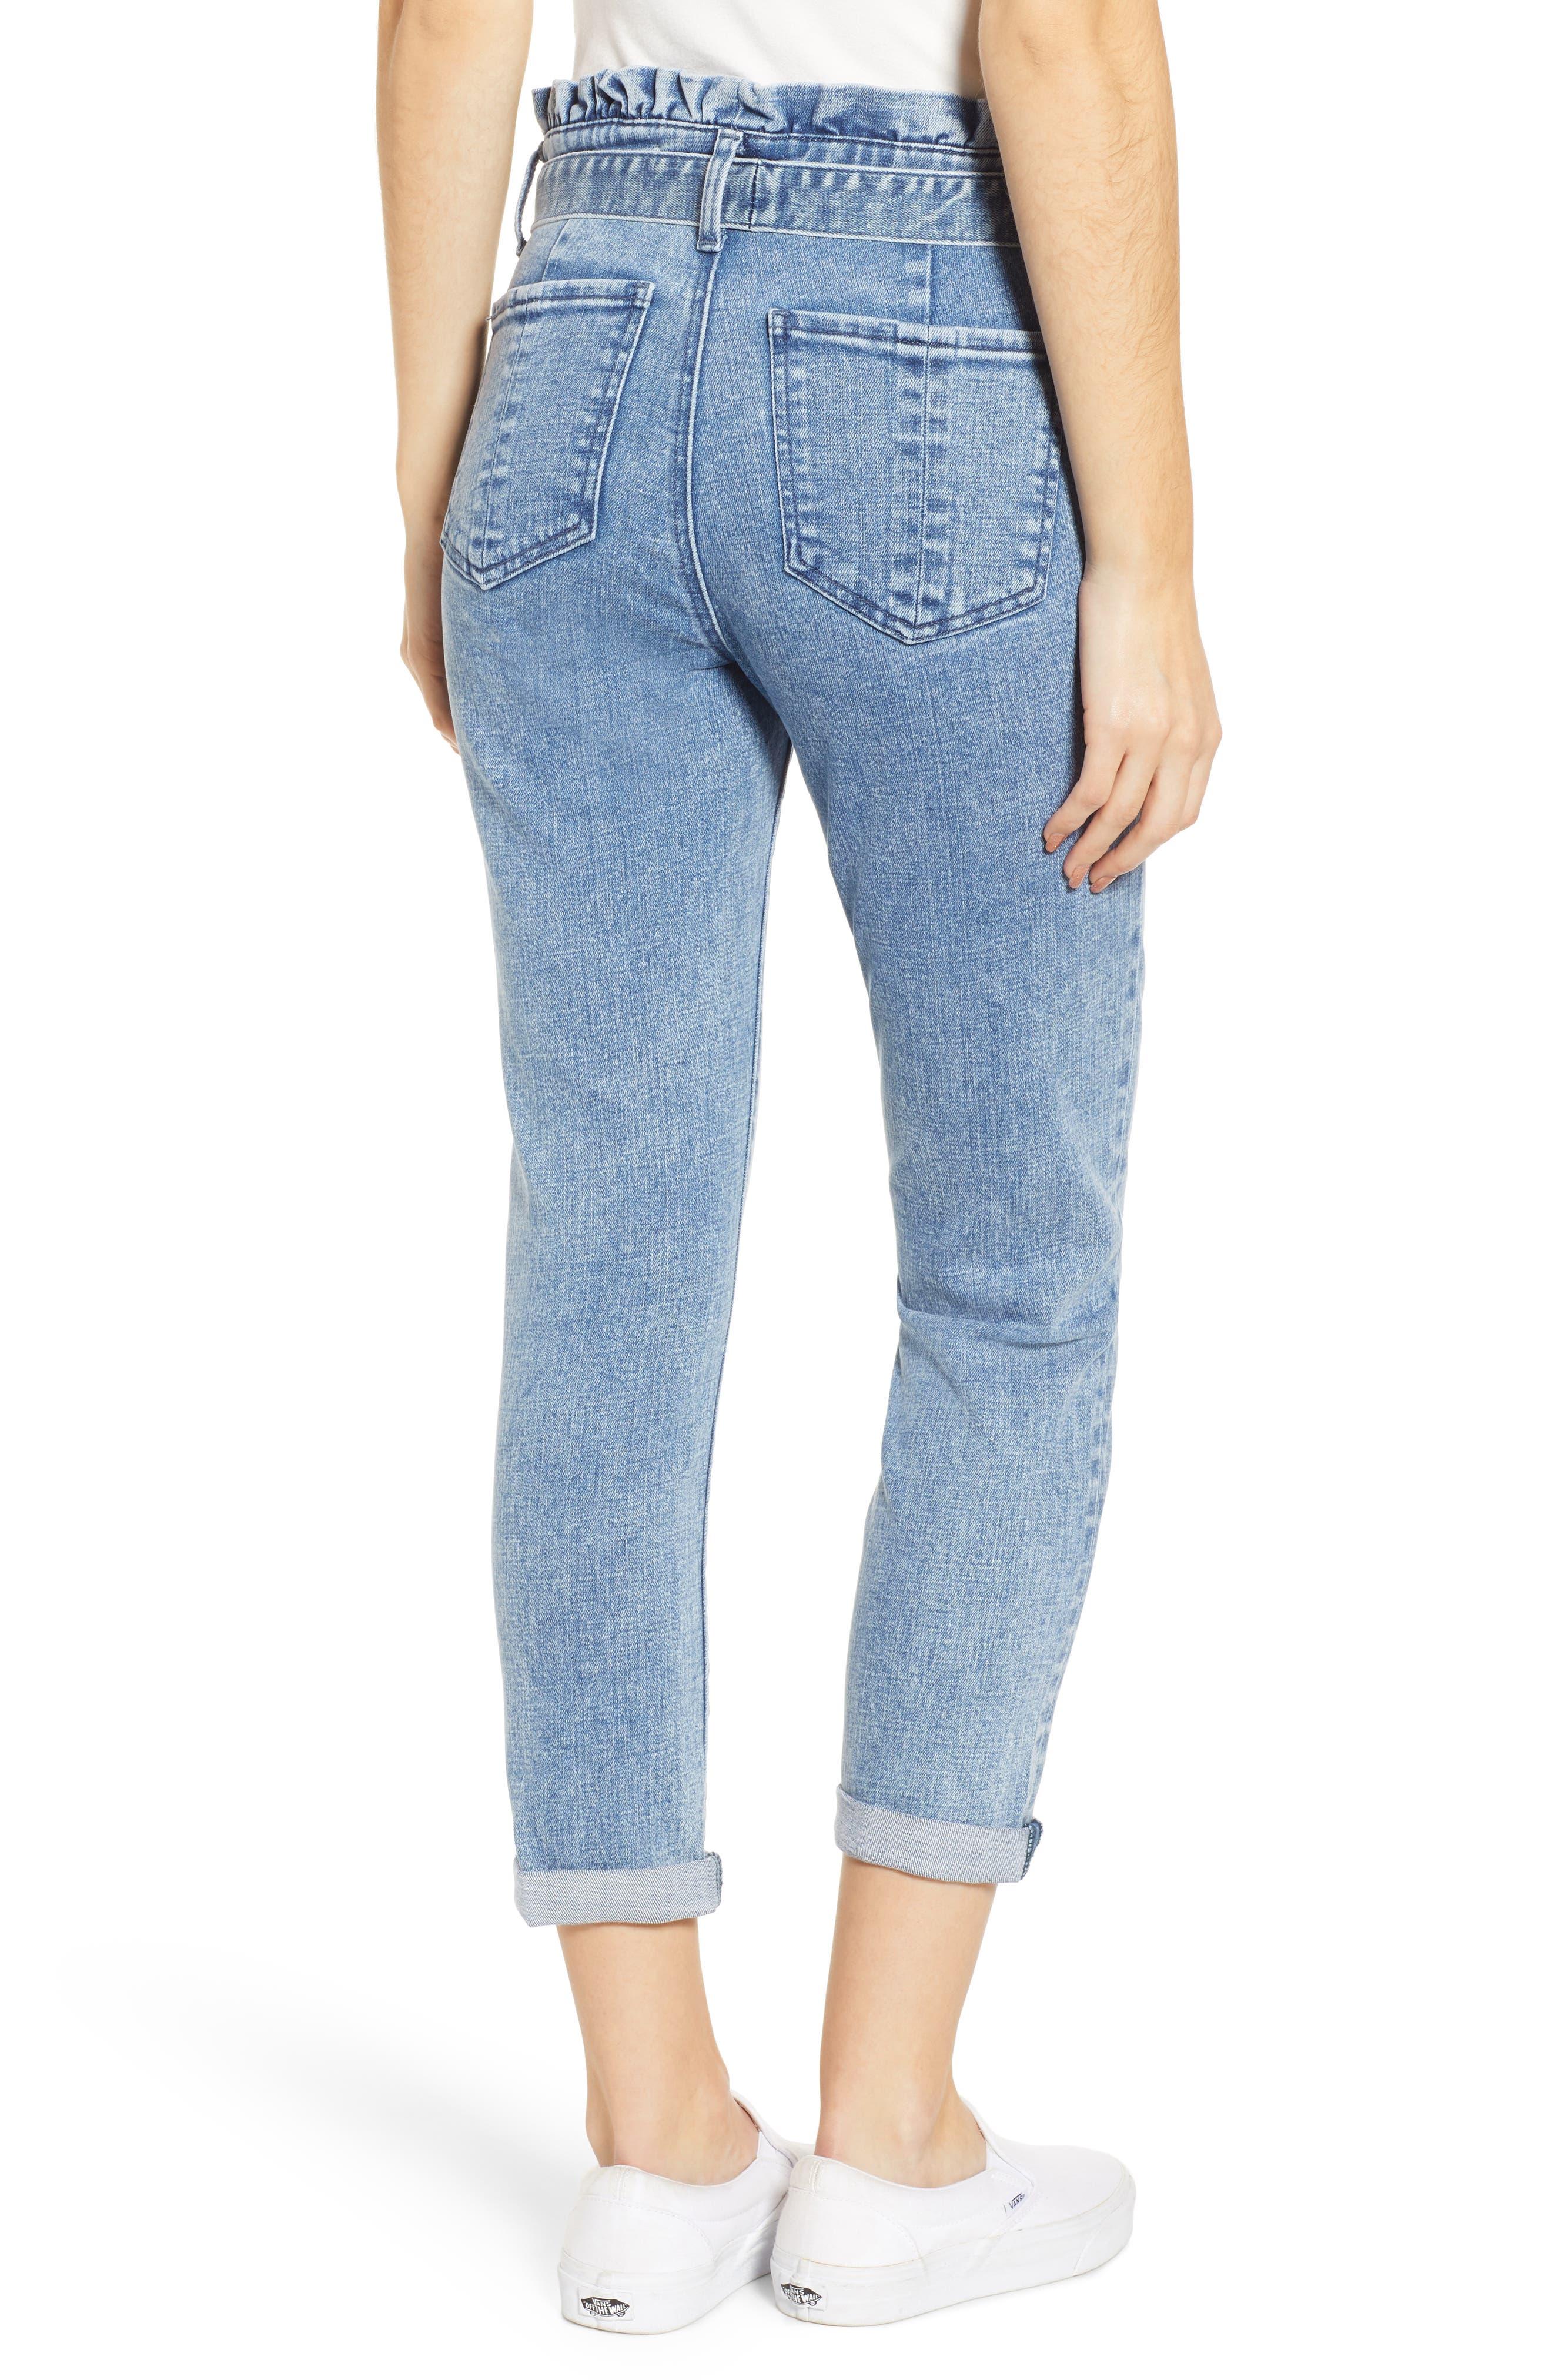 PROSPERITY DENIM, Paperbag Waist Crop Skinny Jeans, Alternate thumbnail 2, color, MEDIUM LIGHT WASH